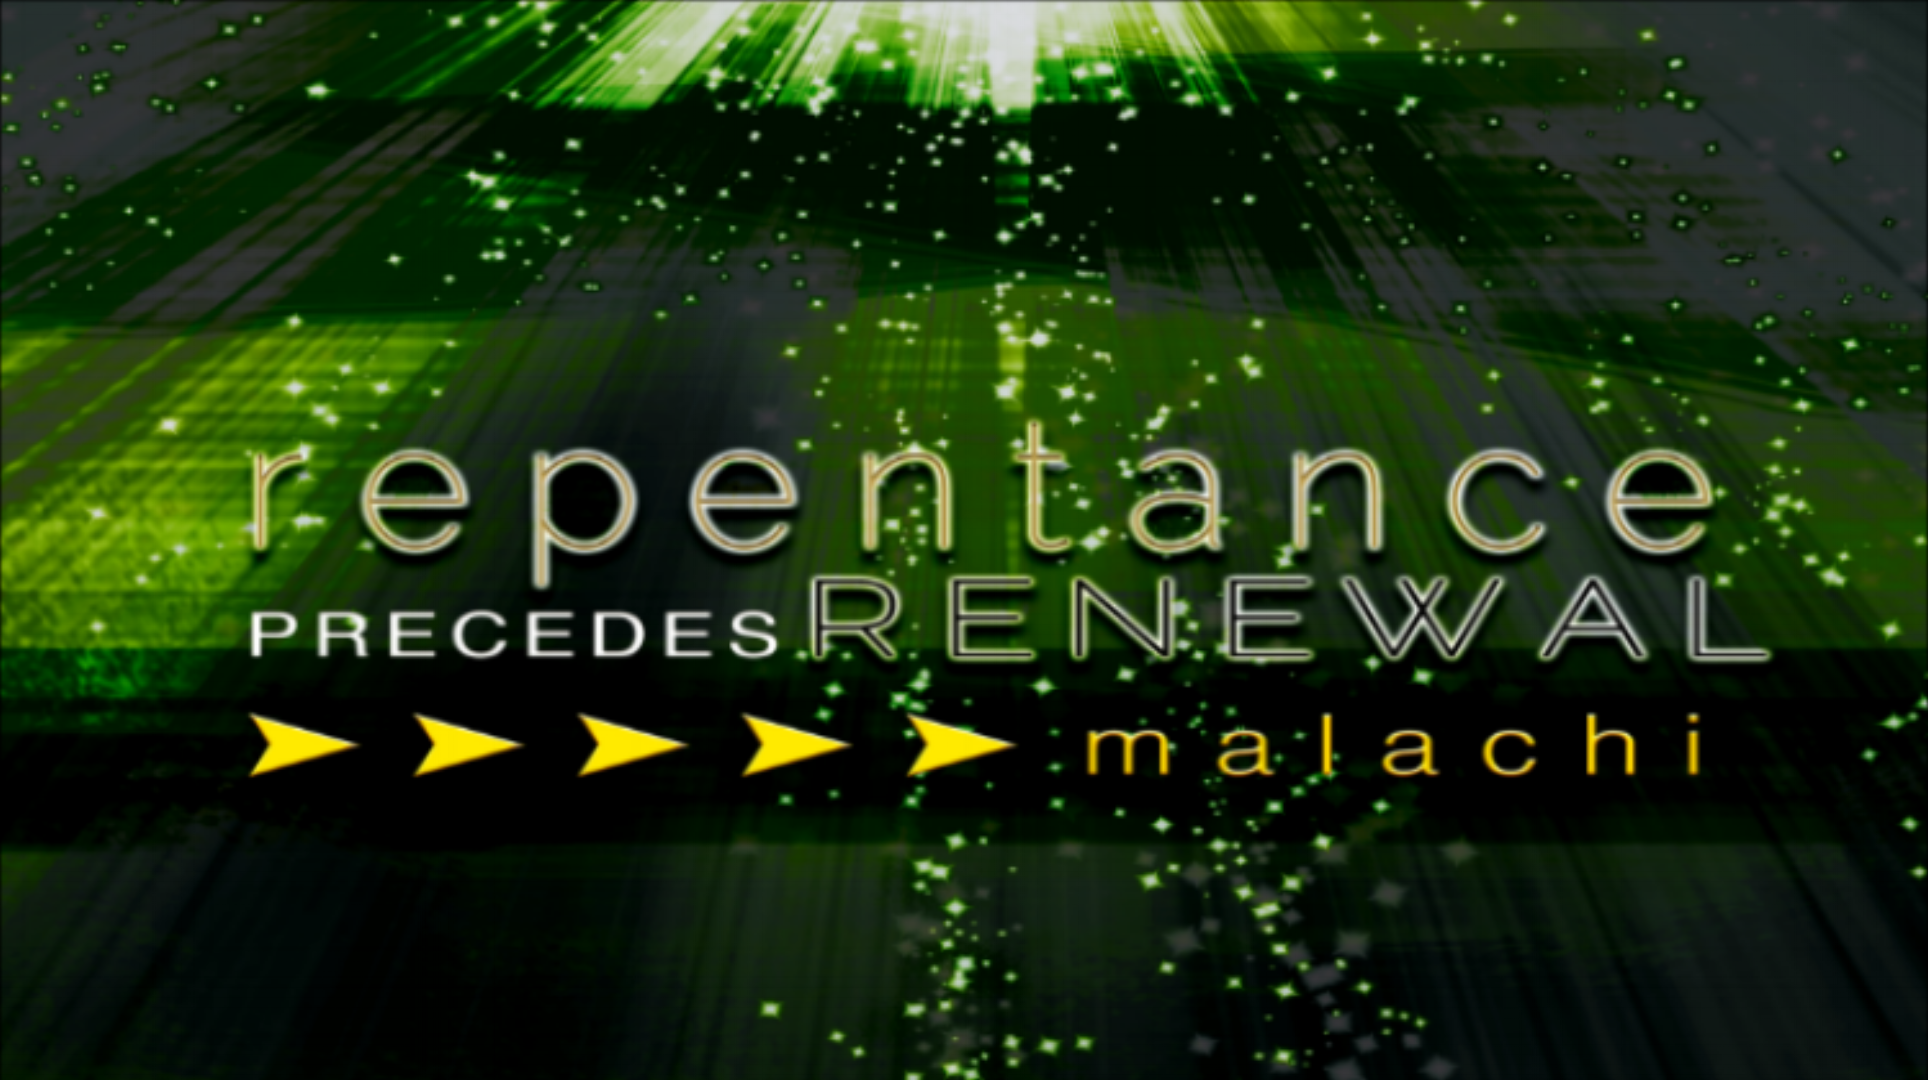 repentance precedes renewal.png